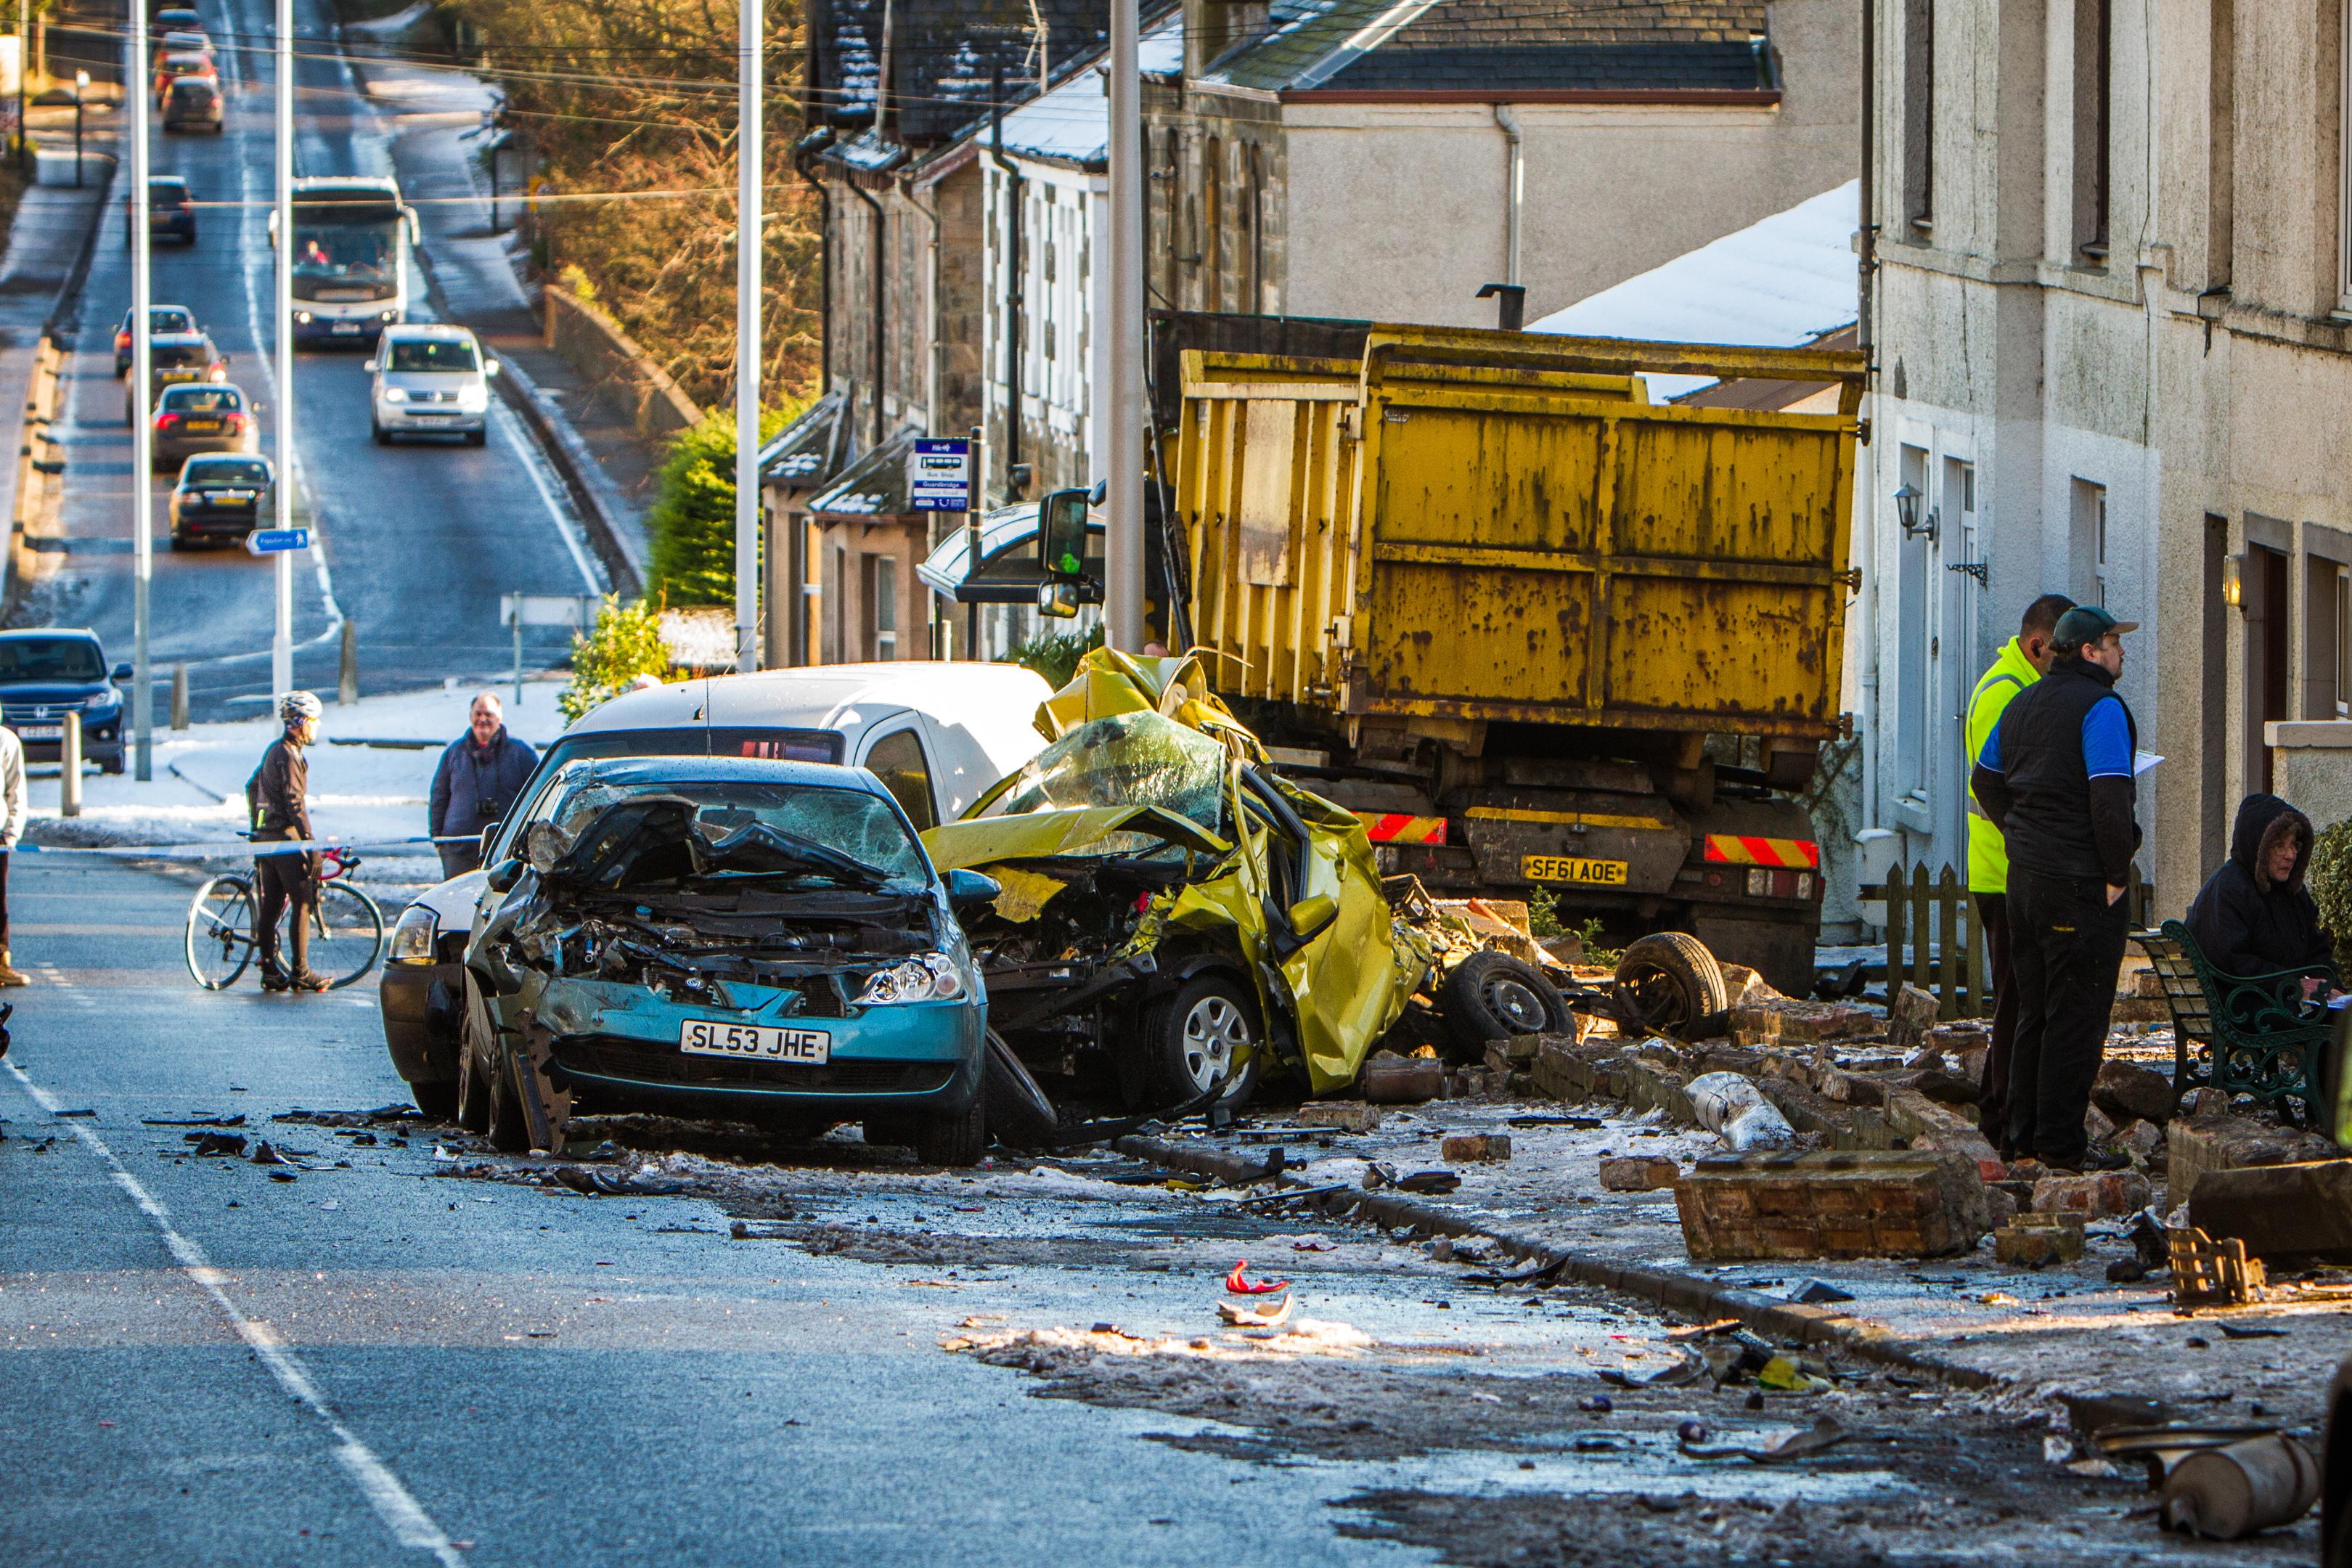 The devastating scene on Cupar Road, Guardbridge